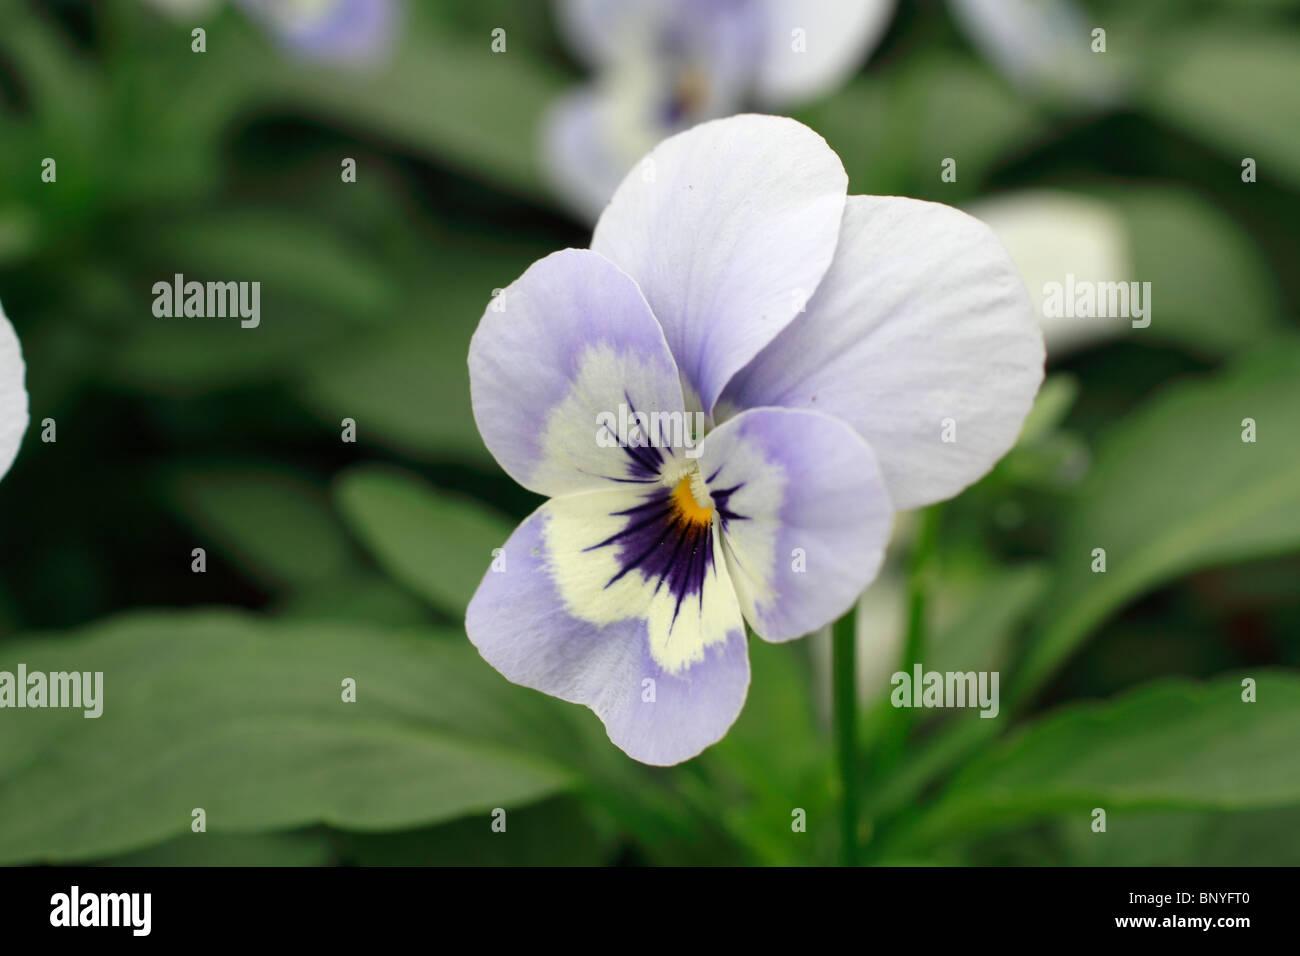 viola, rocky, Viola wittrockiana, annual - Stock Image